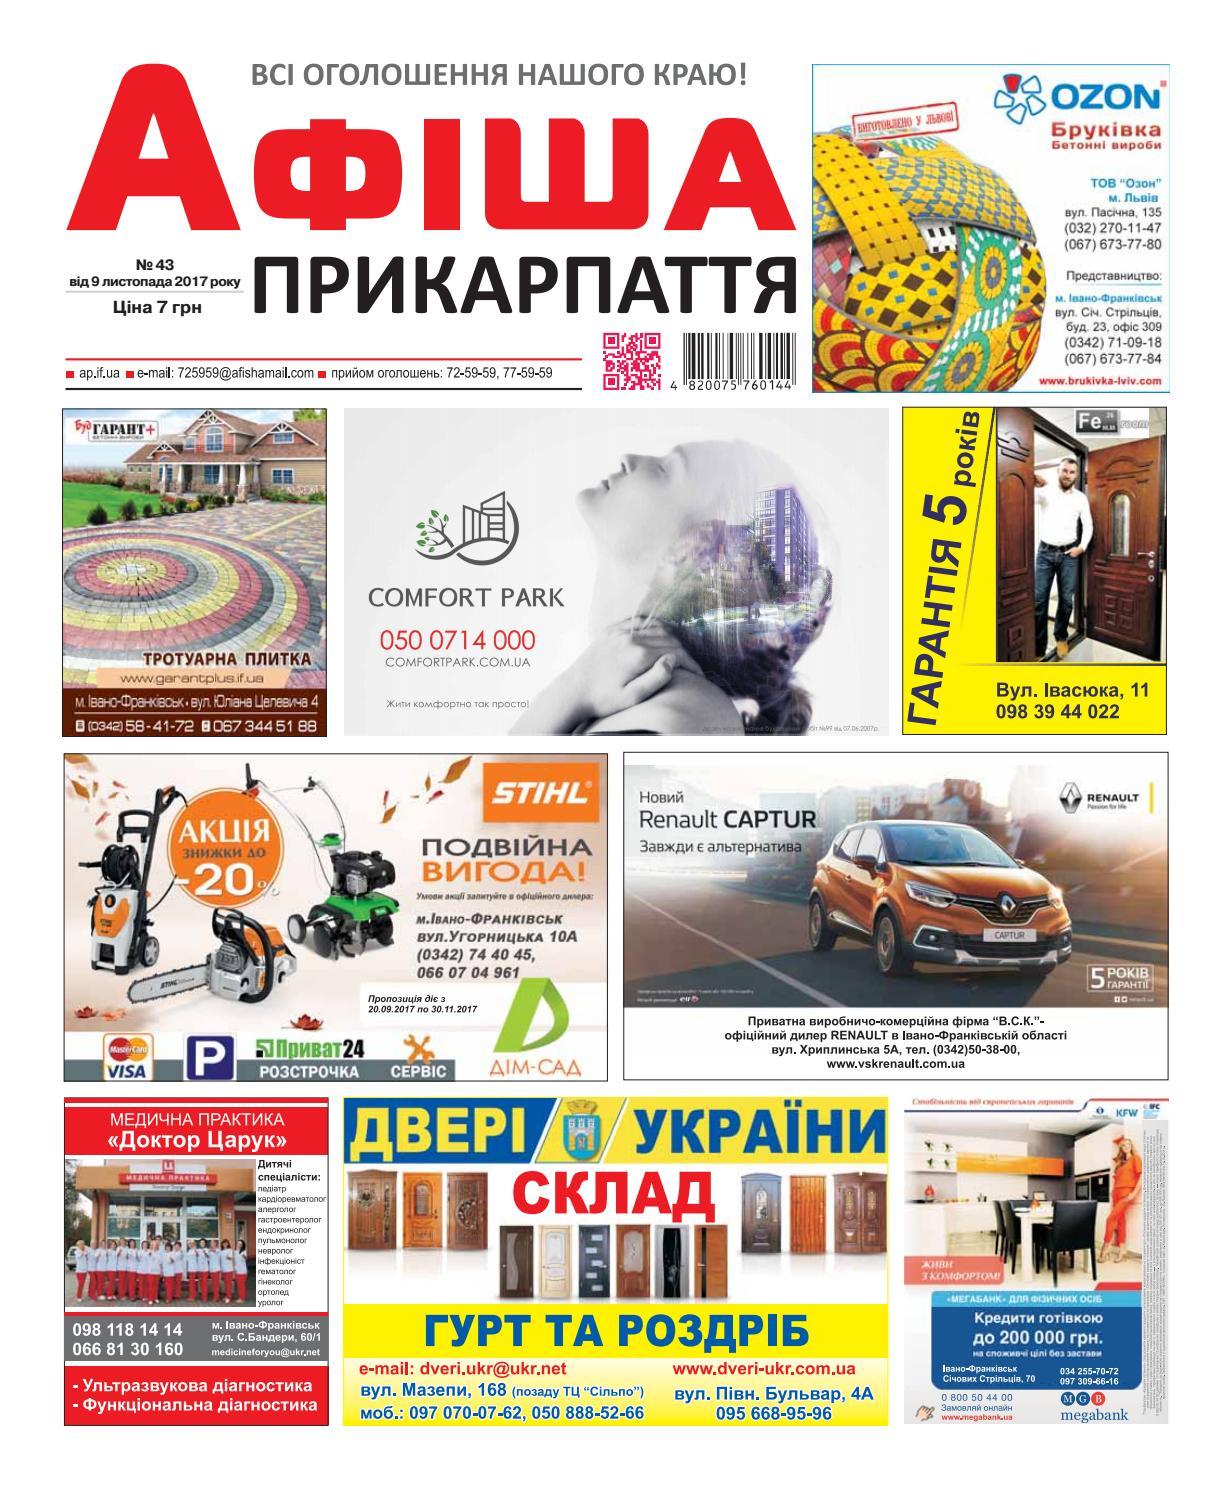 Афіша Прикарпаття 43 by Olya Olya - issuu 4f334eb2d19fd